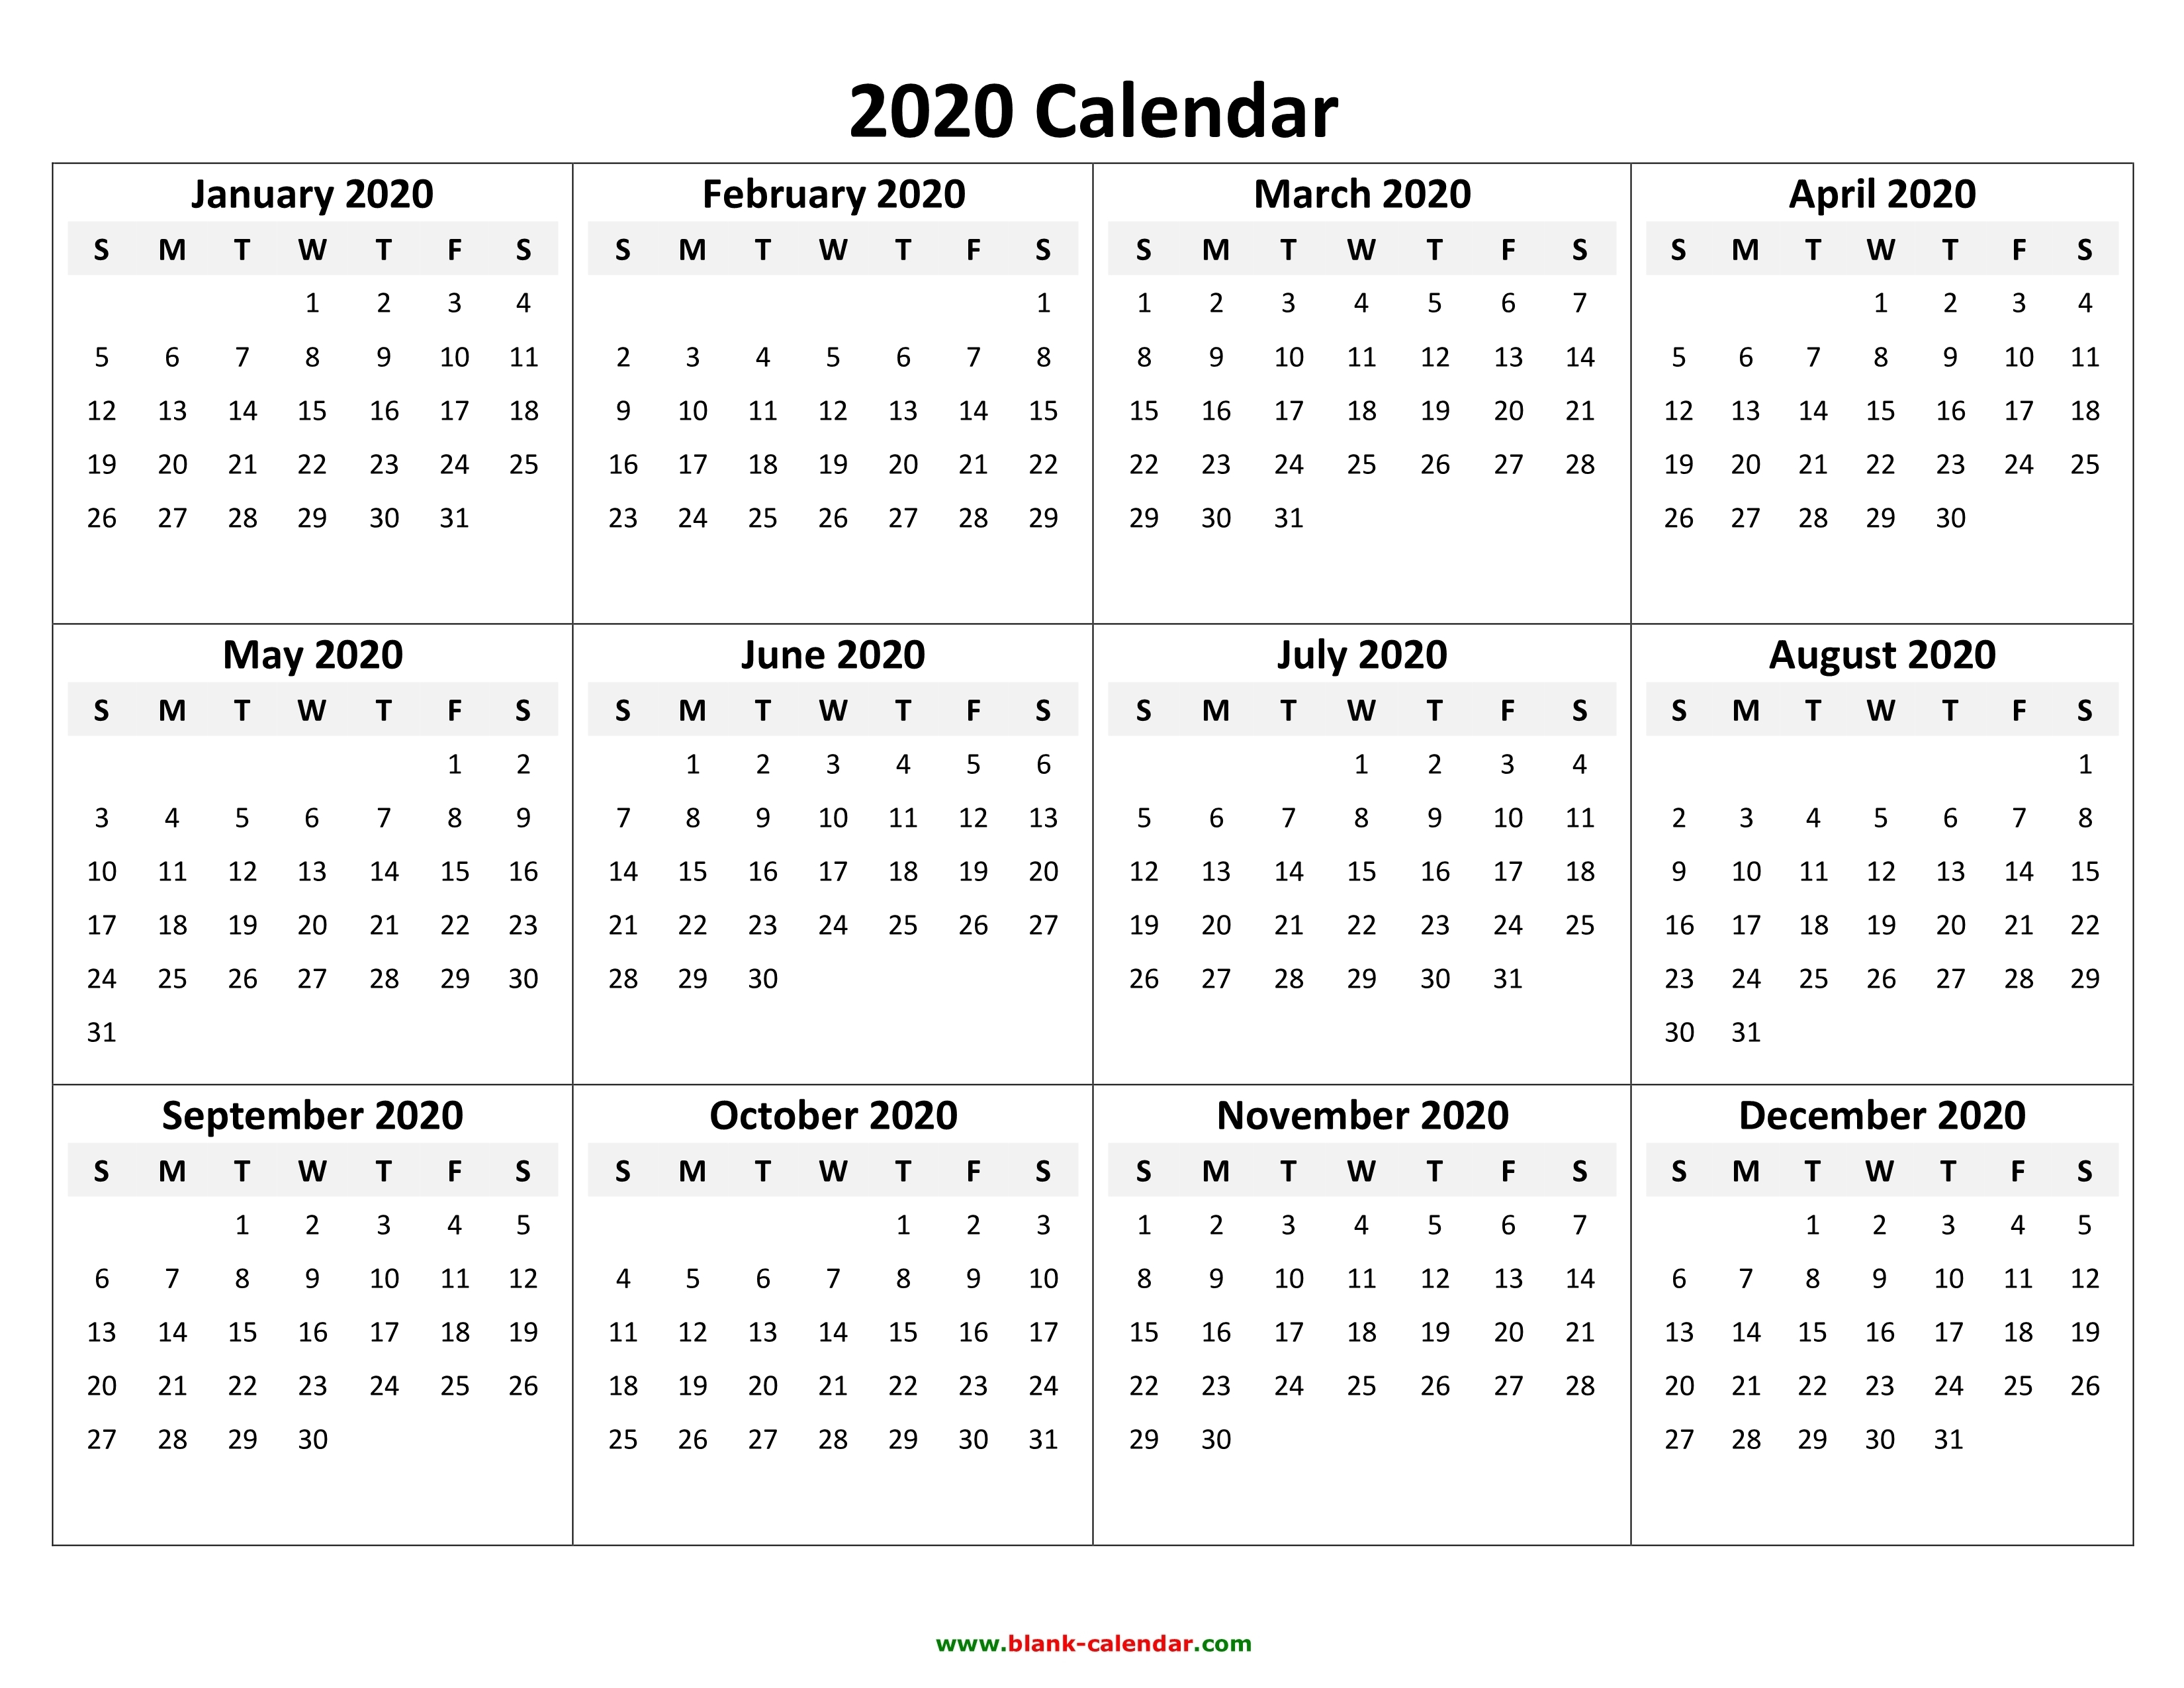 Free Printable 2020 Calendar Template - Wpa.wpart.co inside 2020 Printable Monthly Calendar Free Vertex